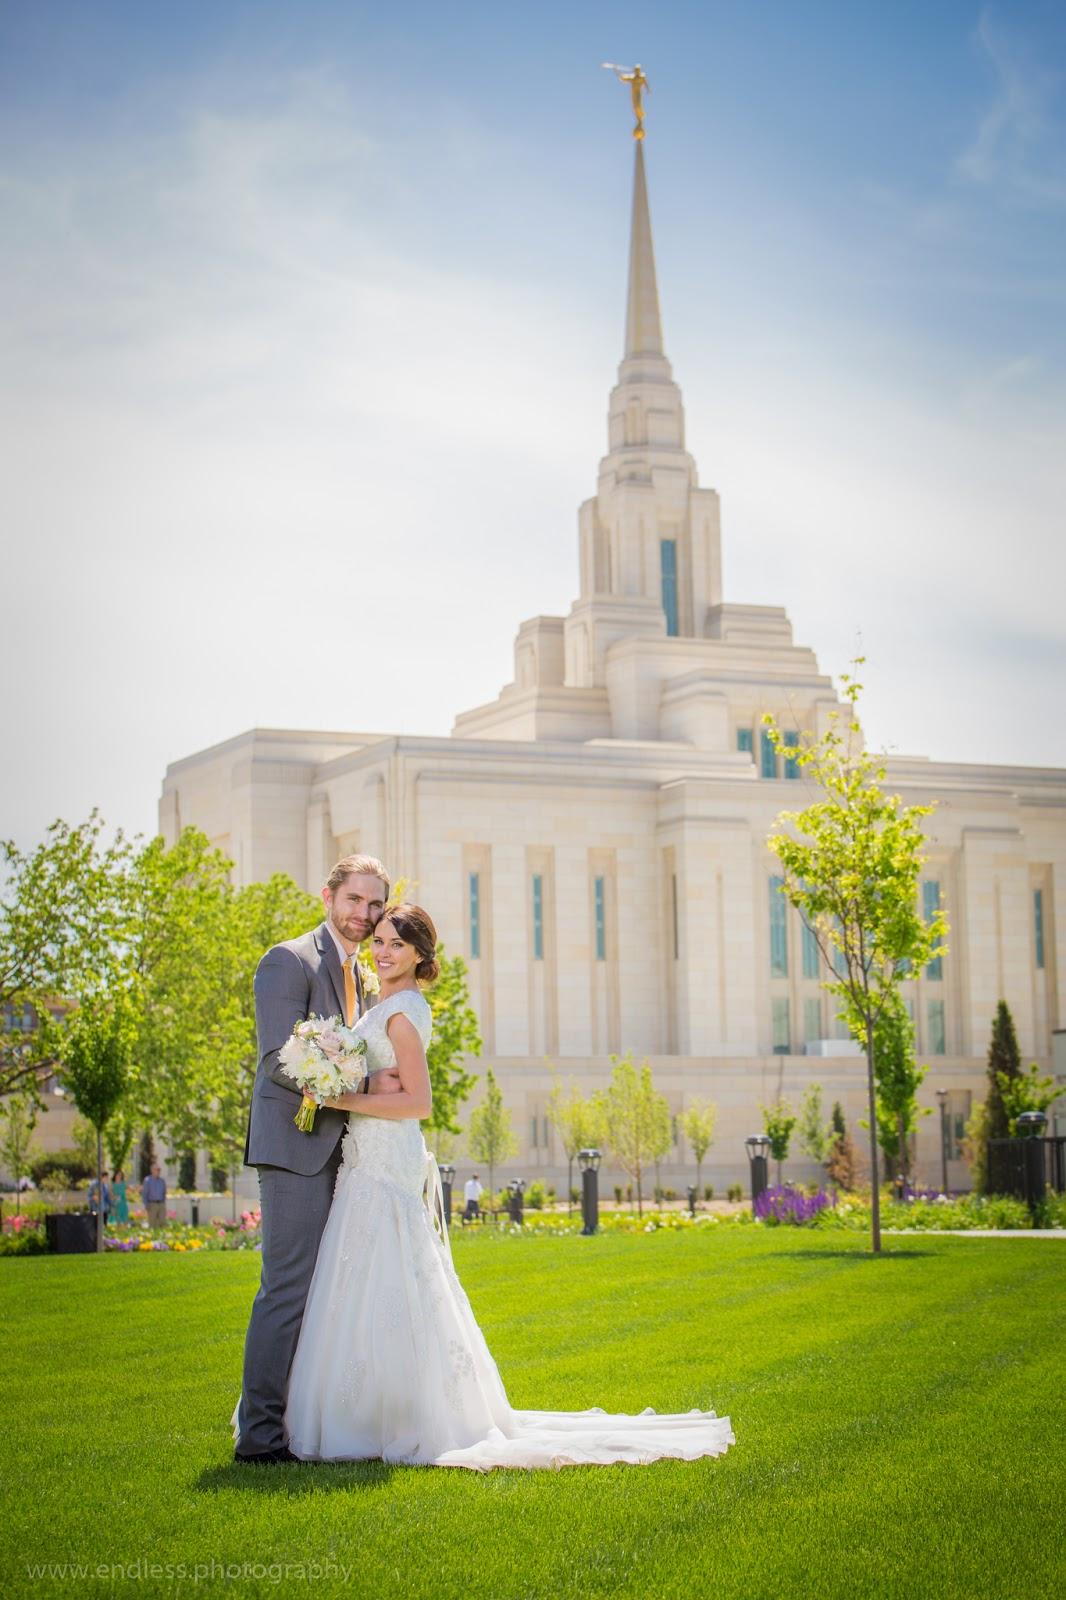 Logan, Utah, Wedding, Photographer, Photography, Weddings, Photographers, Utah, Ogden, Logan, Cache Valley, Temple, Couple, Bridals, Wedding Dress, LDS, Summer